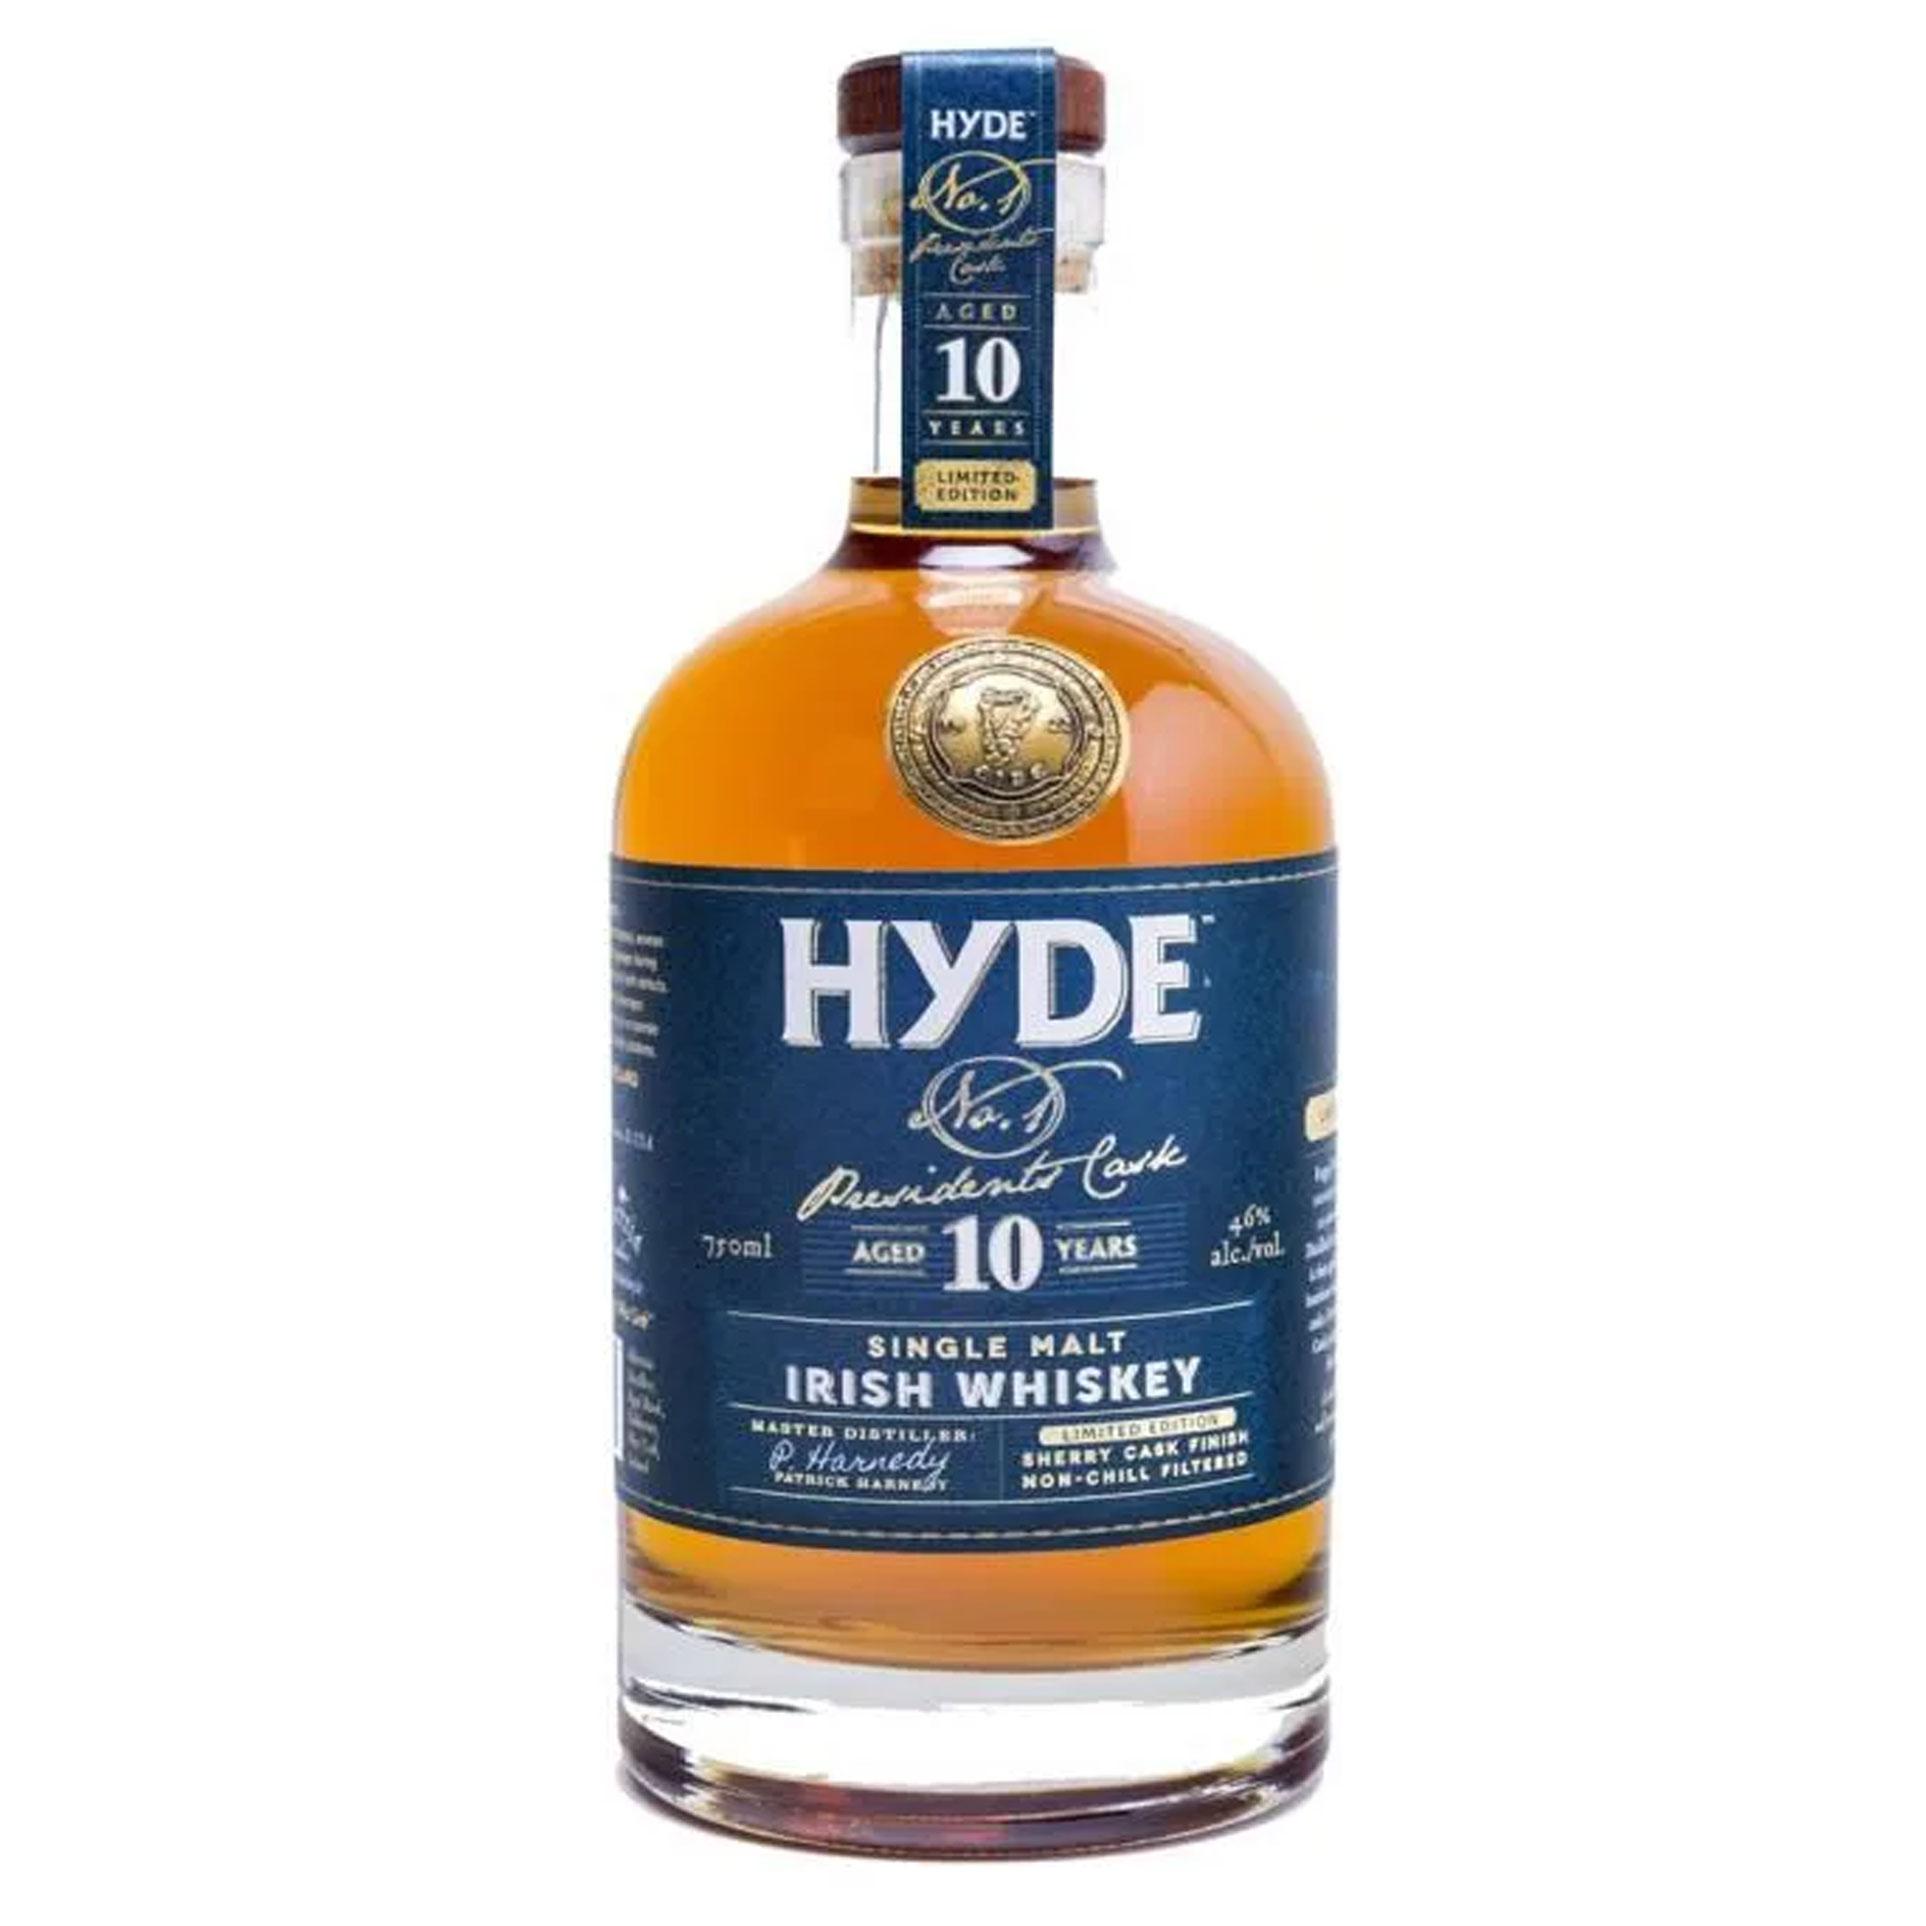 Whisky - Hyde - N°7 - Sherry Finition - Irlande - Non Tourbé